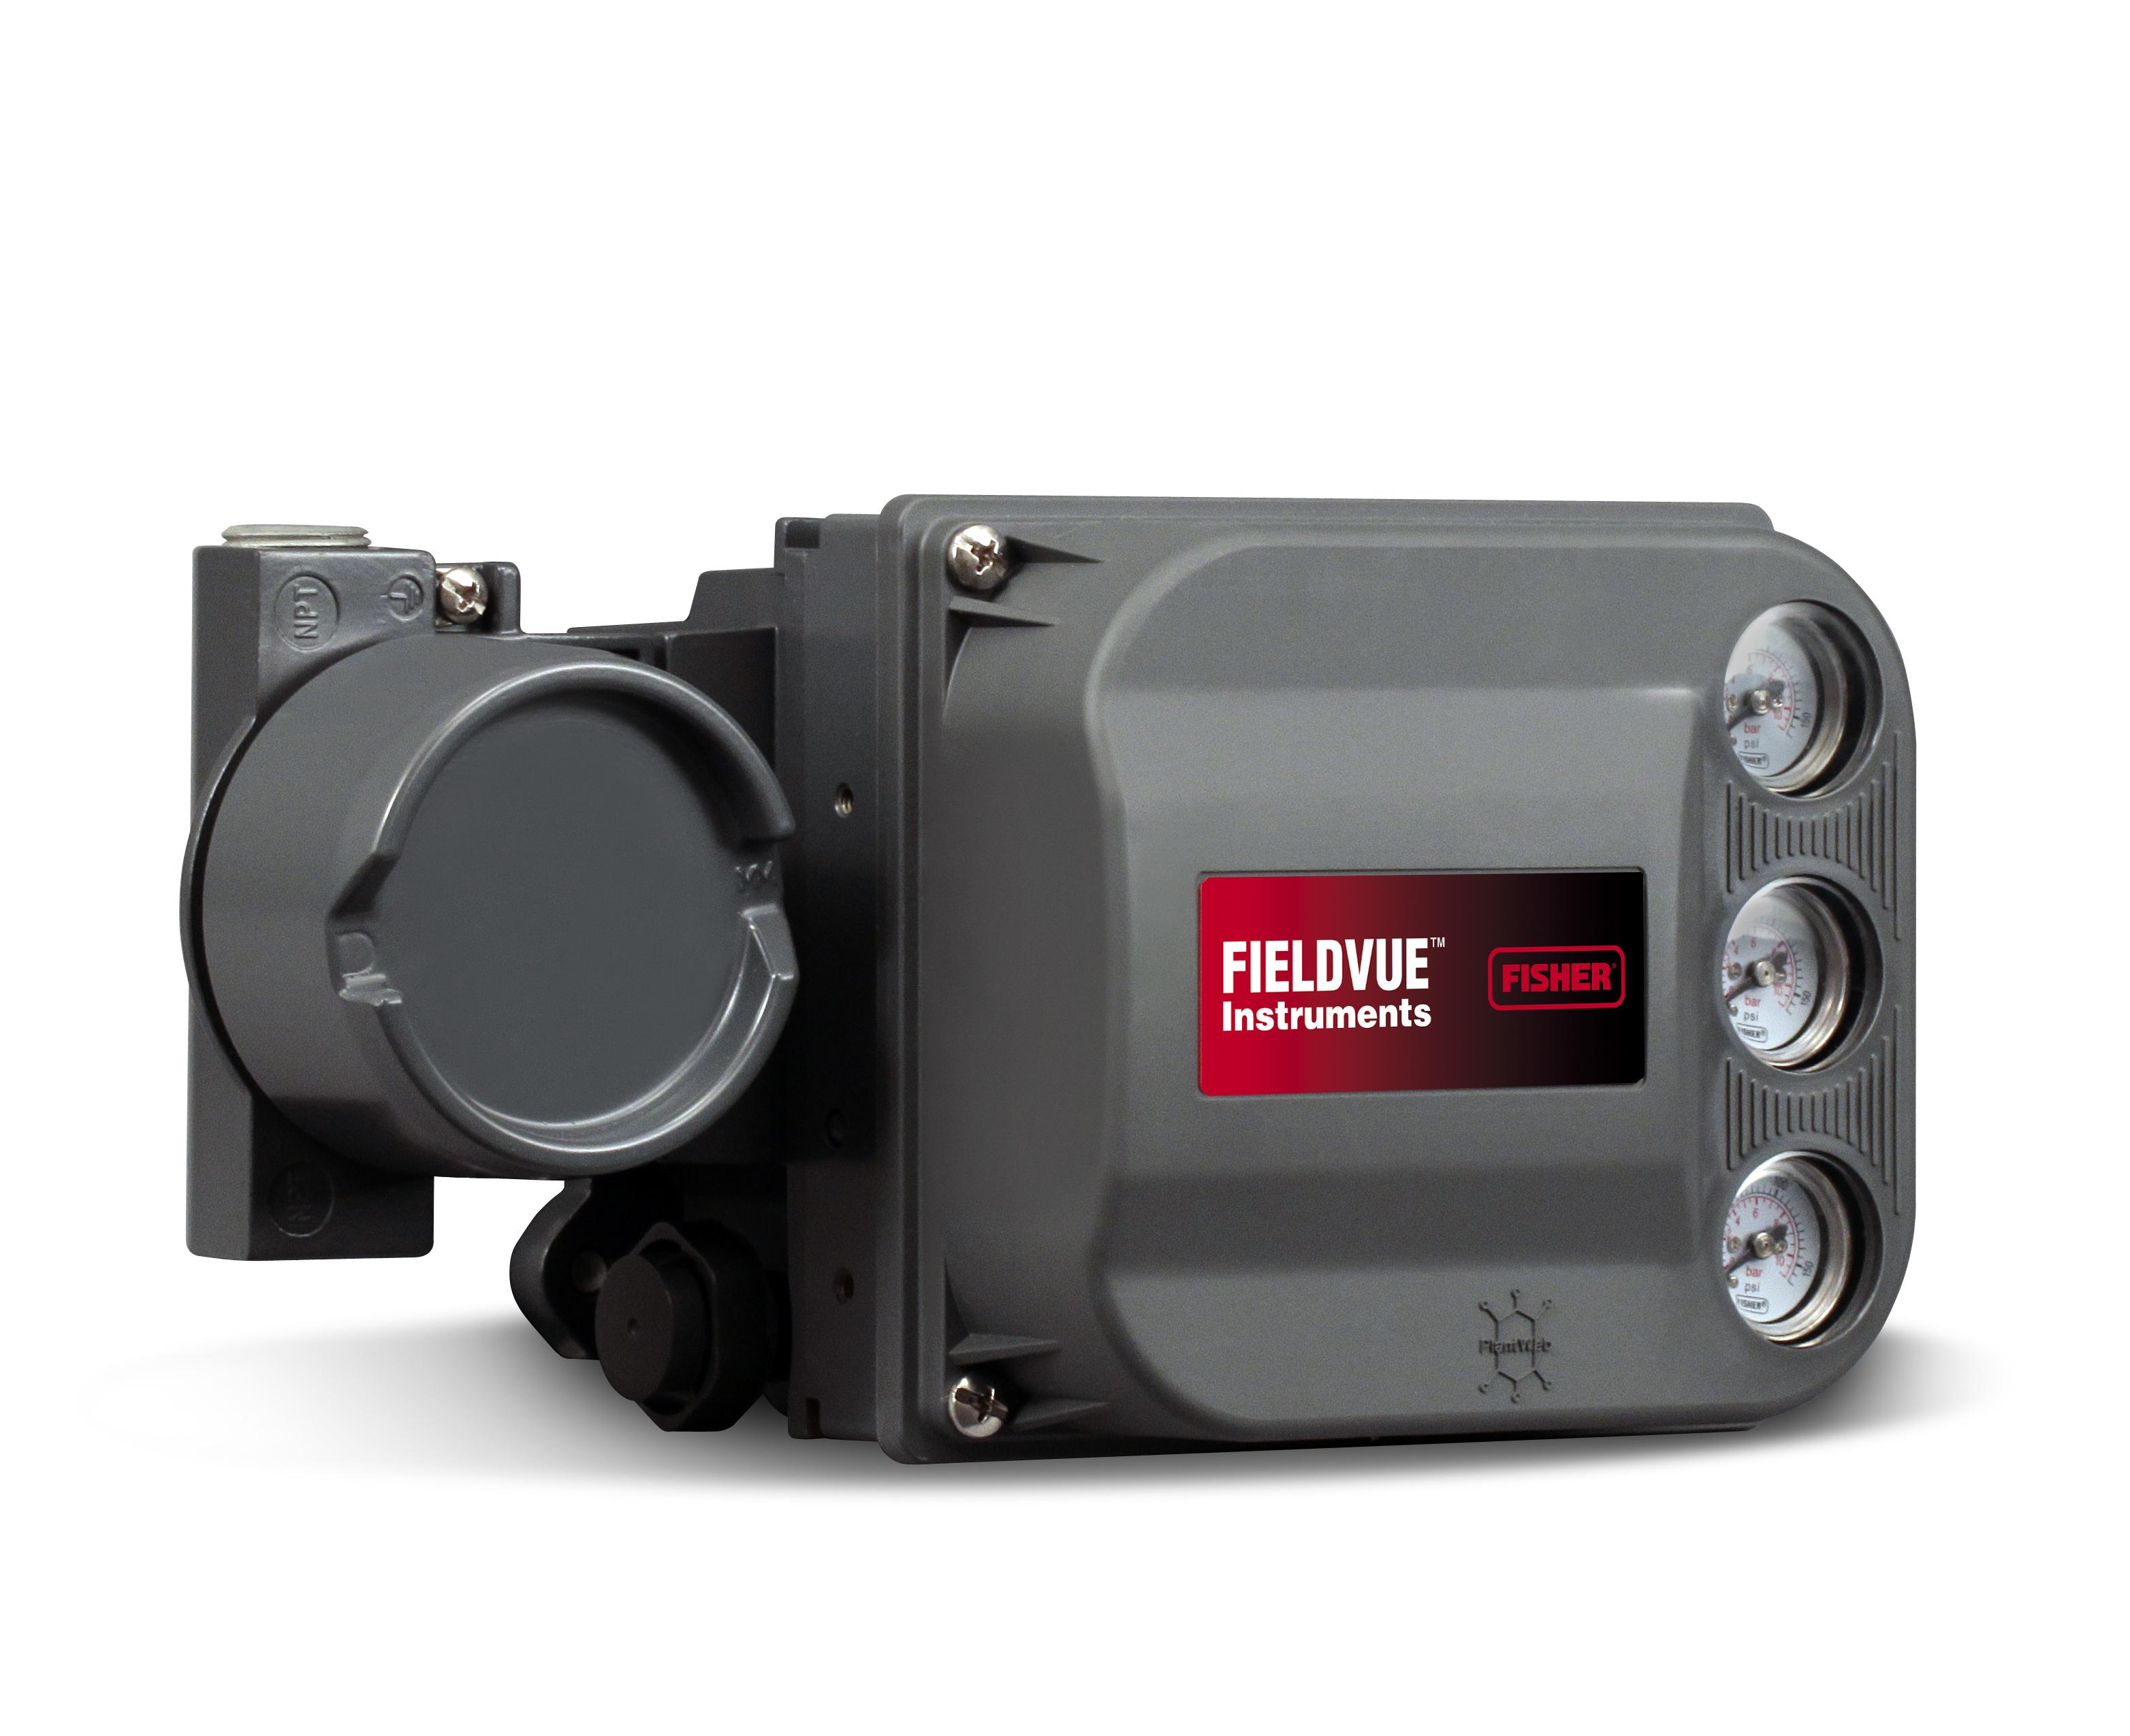 prod fish fisher x0338 c006 data 344100 fisher digital valve controller dvc6200 emerson gb